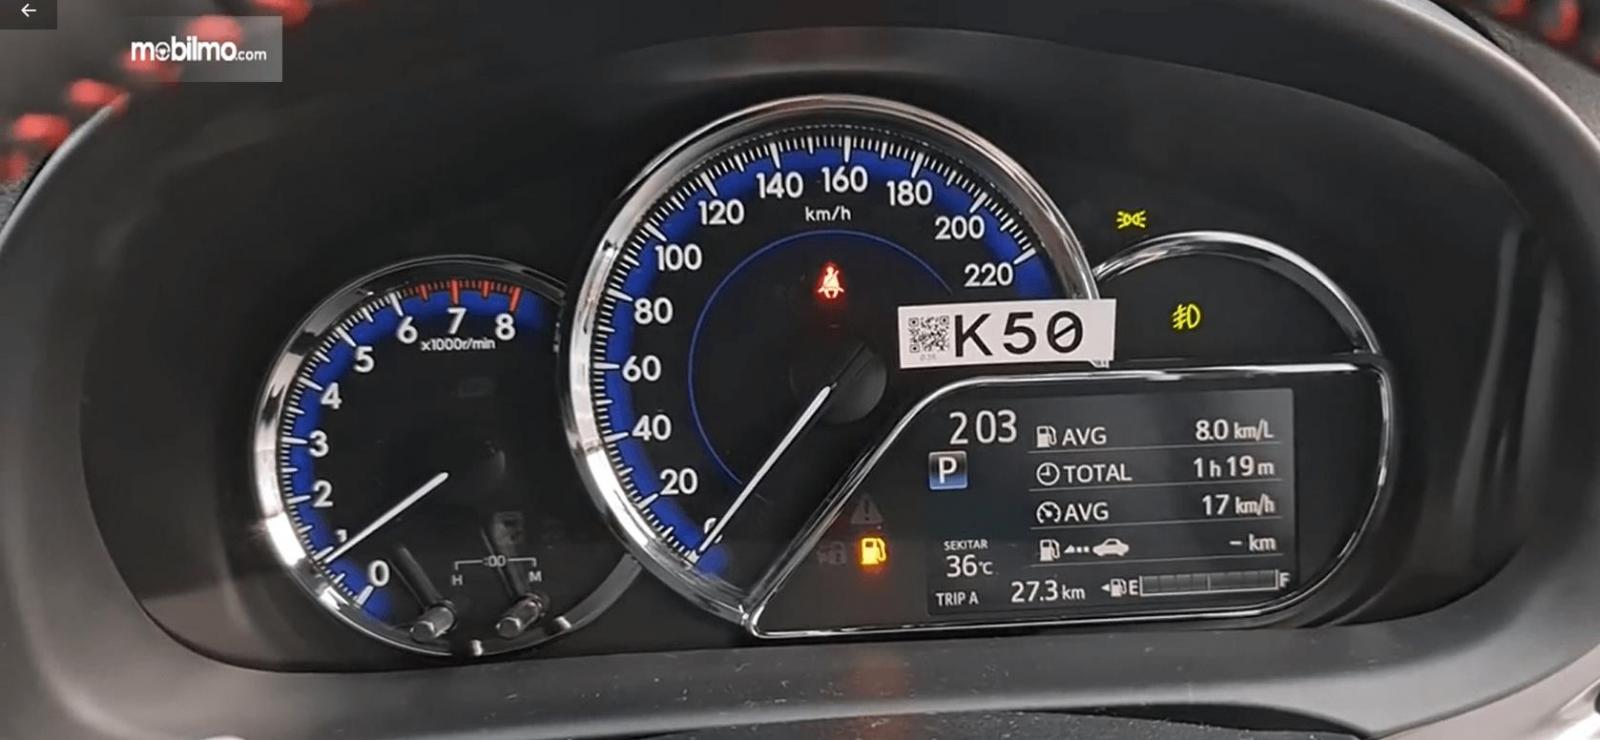 Gambar ini menunjukkan layar MID Toyota Yaris TRD Sportivo CVT 2020